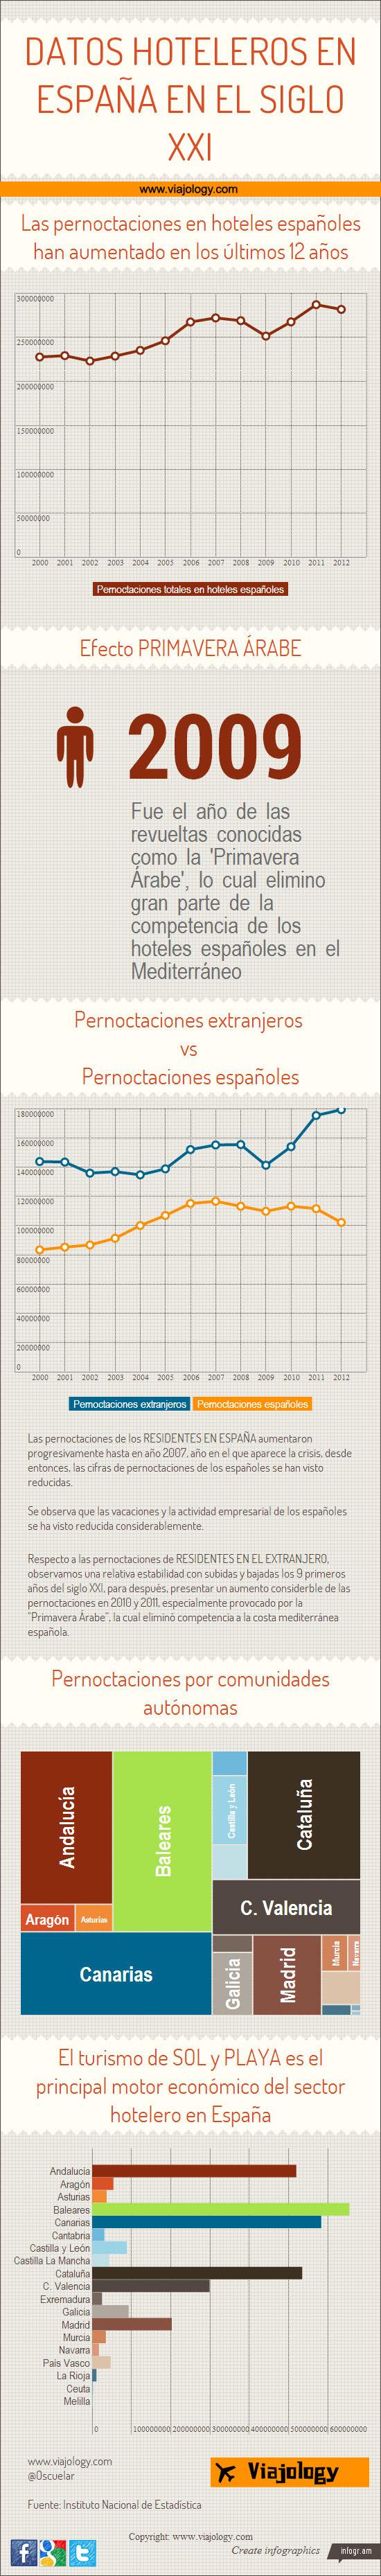 Datos hoteleros España en el siglo XXI